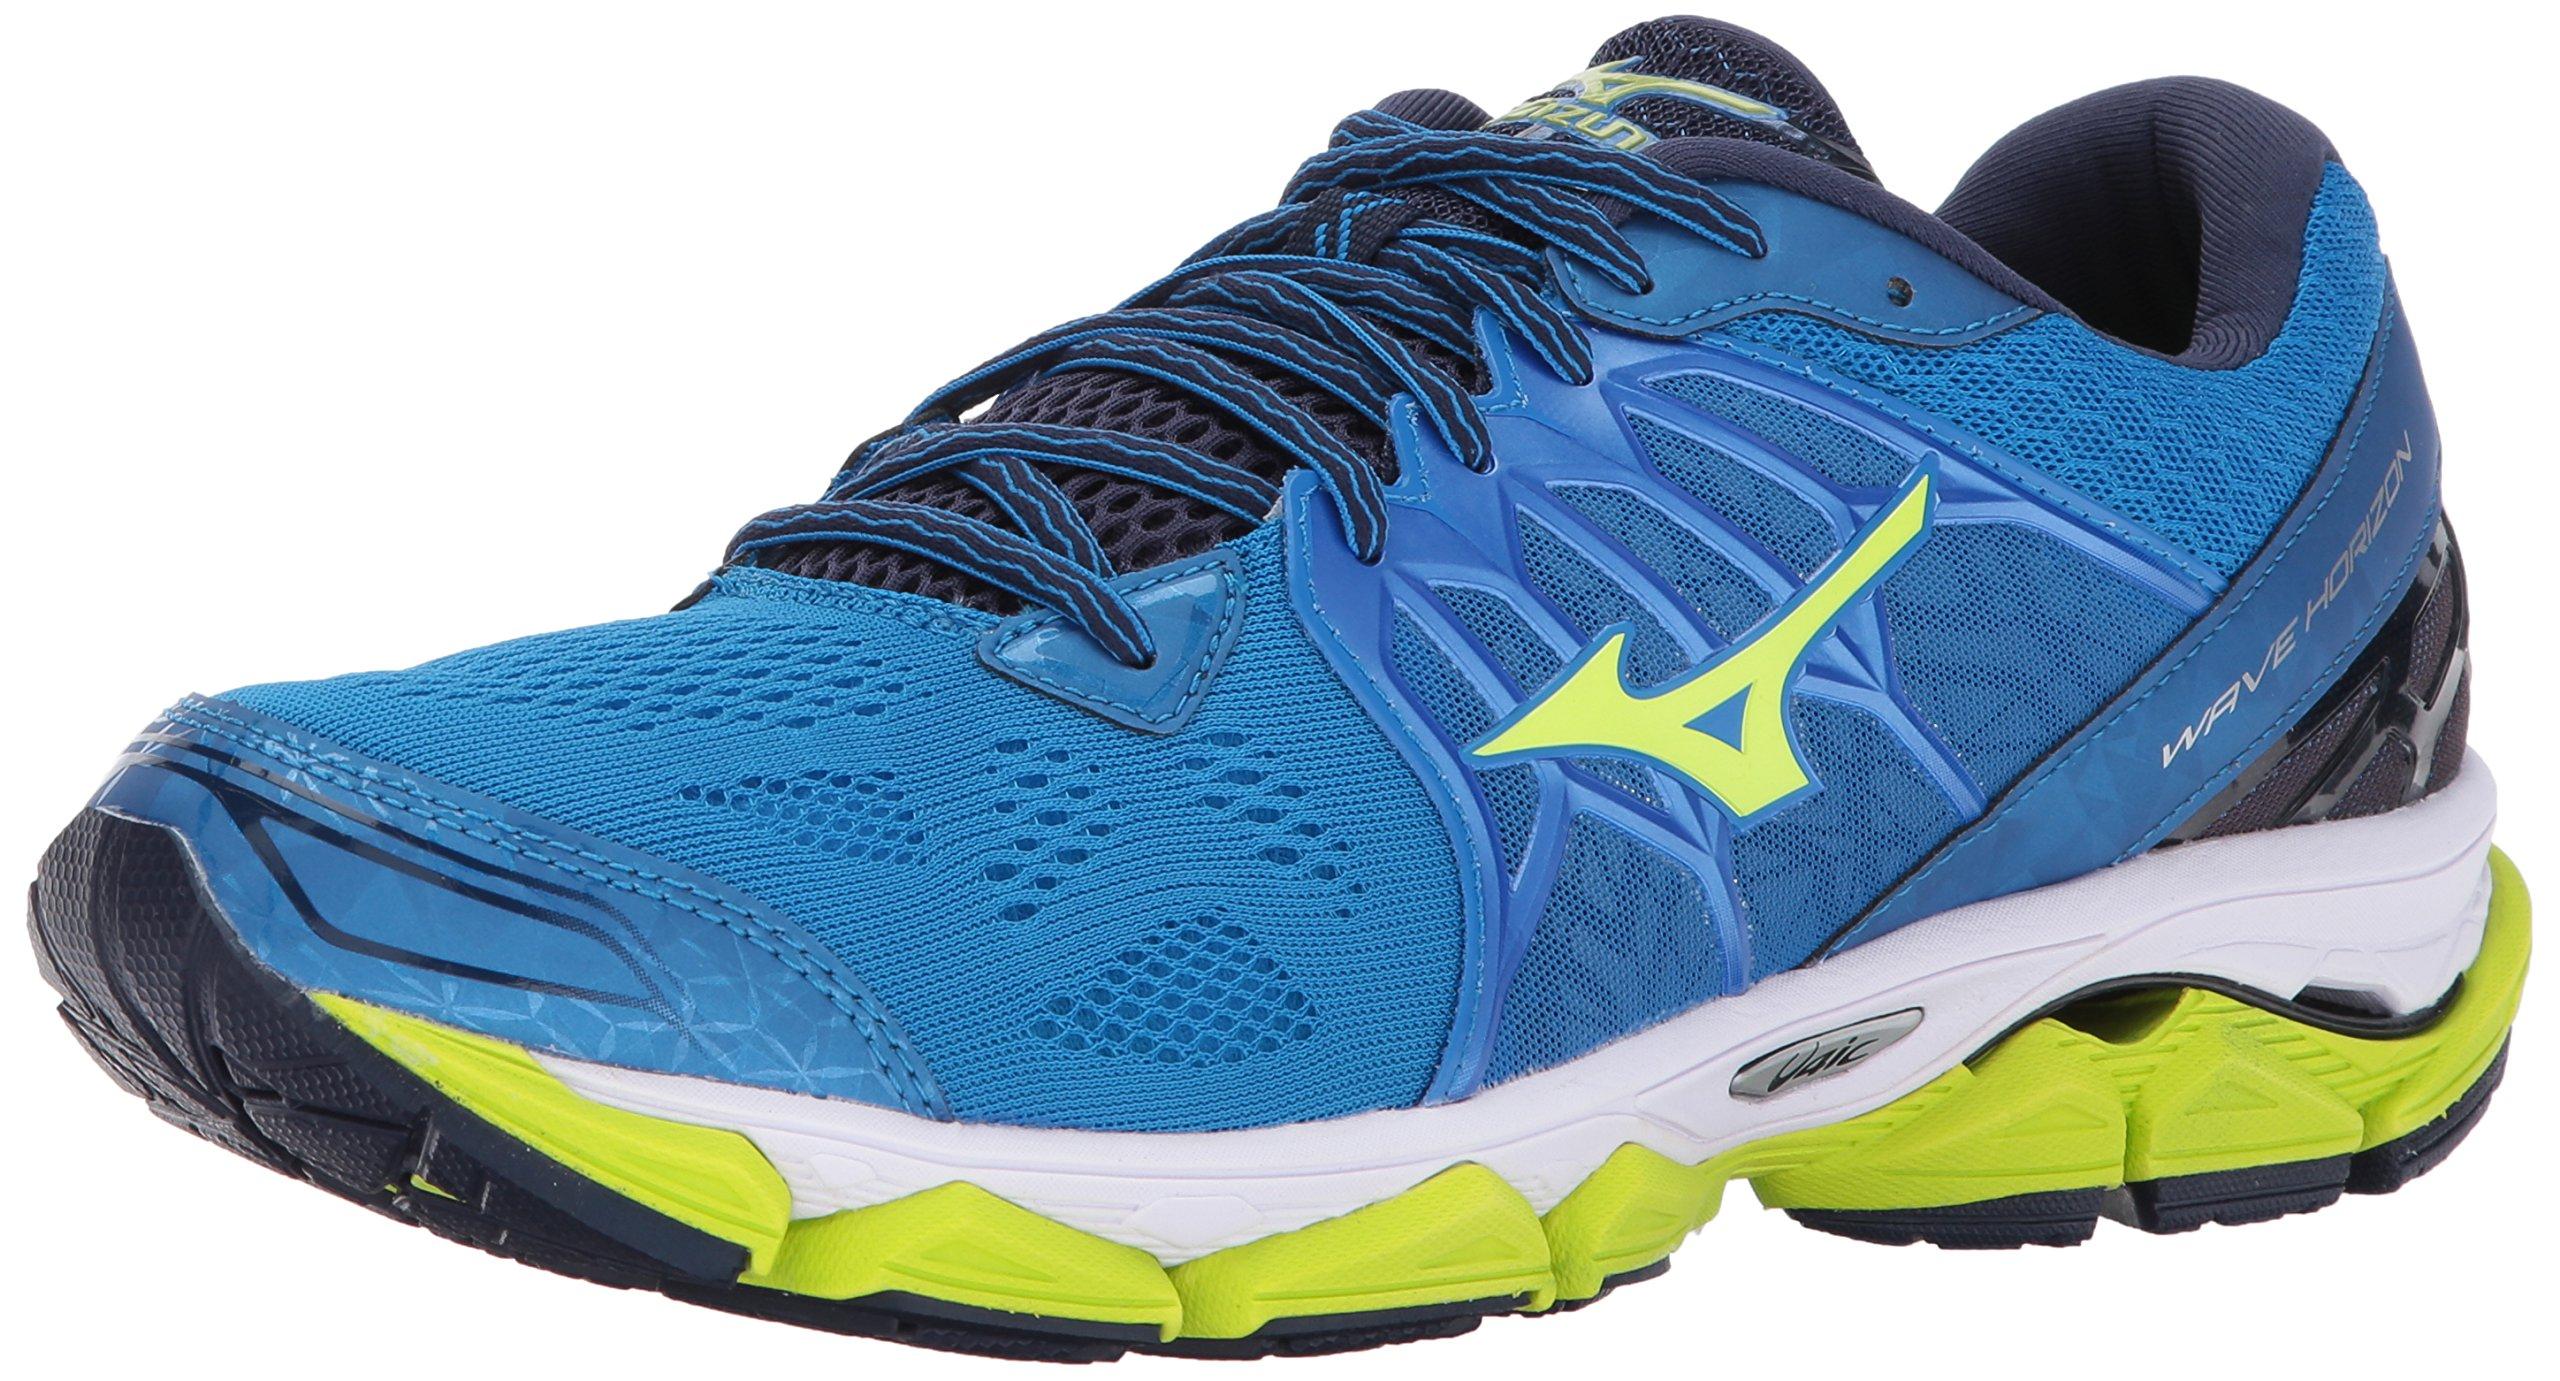 Mizuno Running Men's Mizuno Wave Horizon Running-Shoes, Directoire Blue/Safey Yellow/Peacoat, 11.5 D US